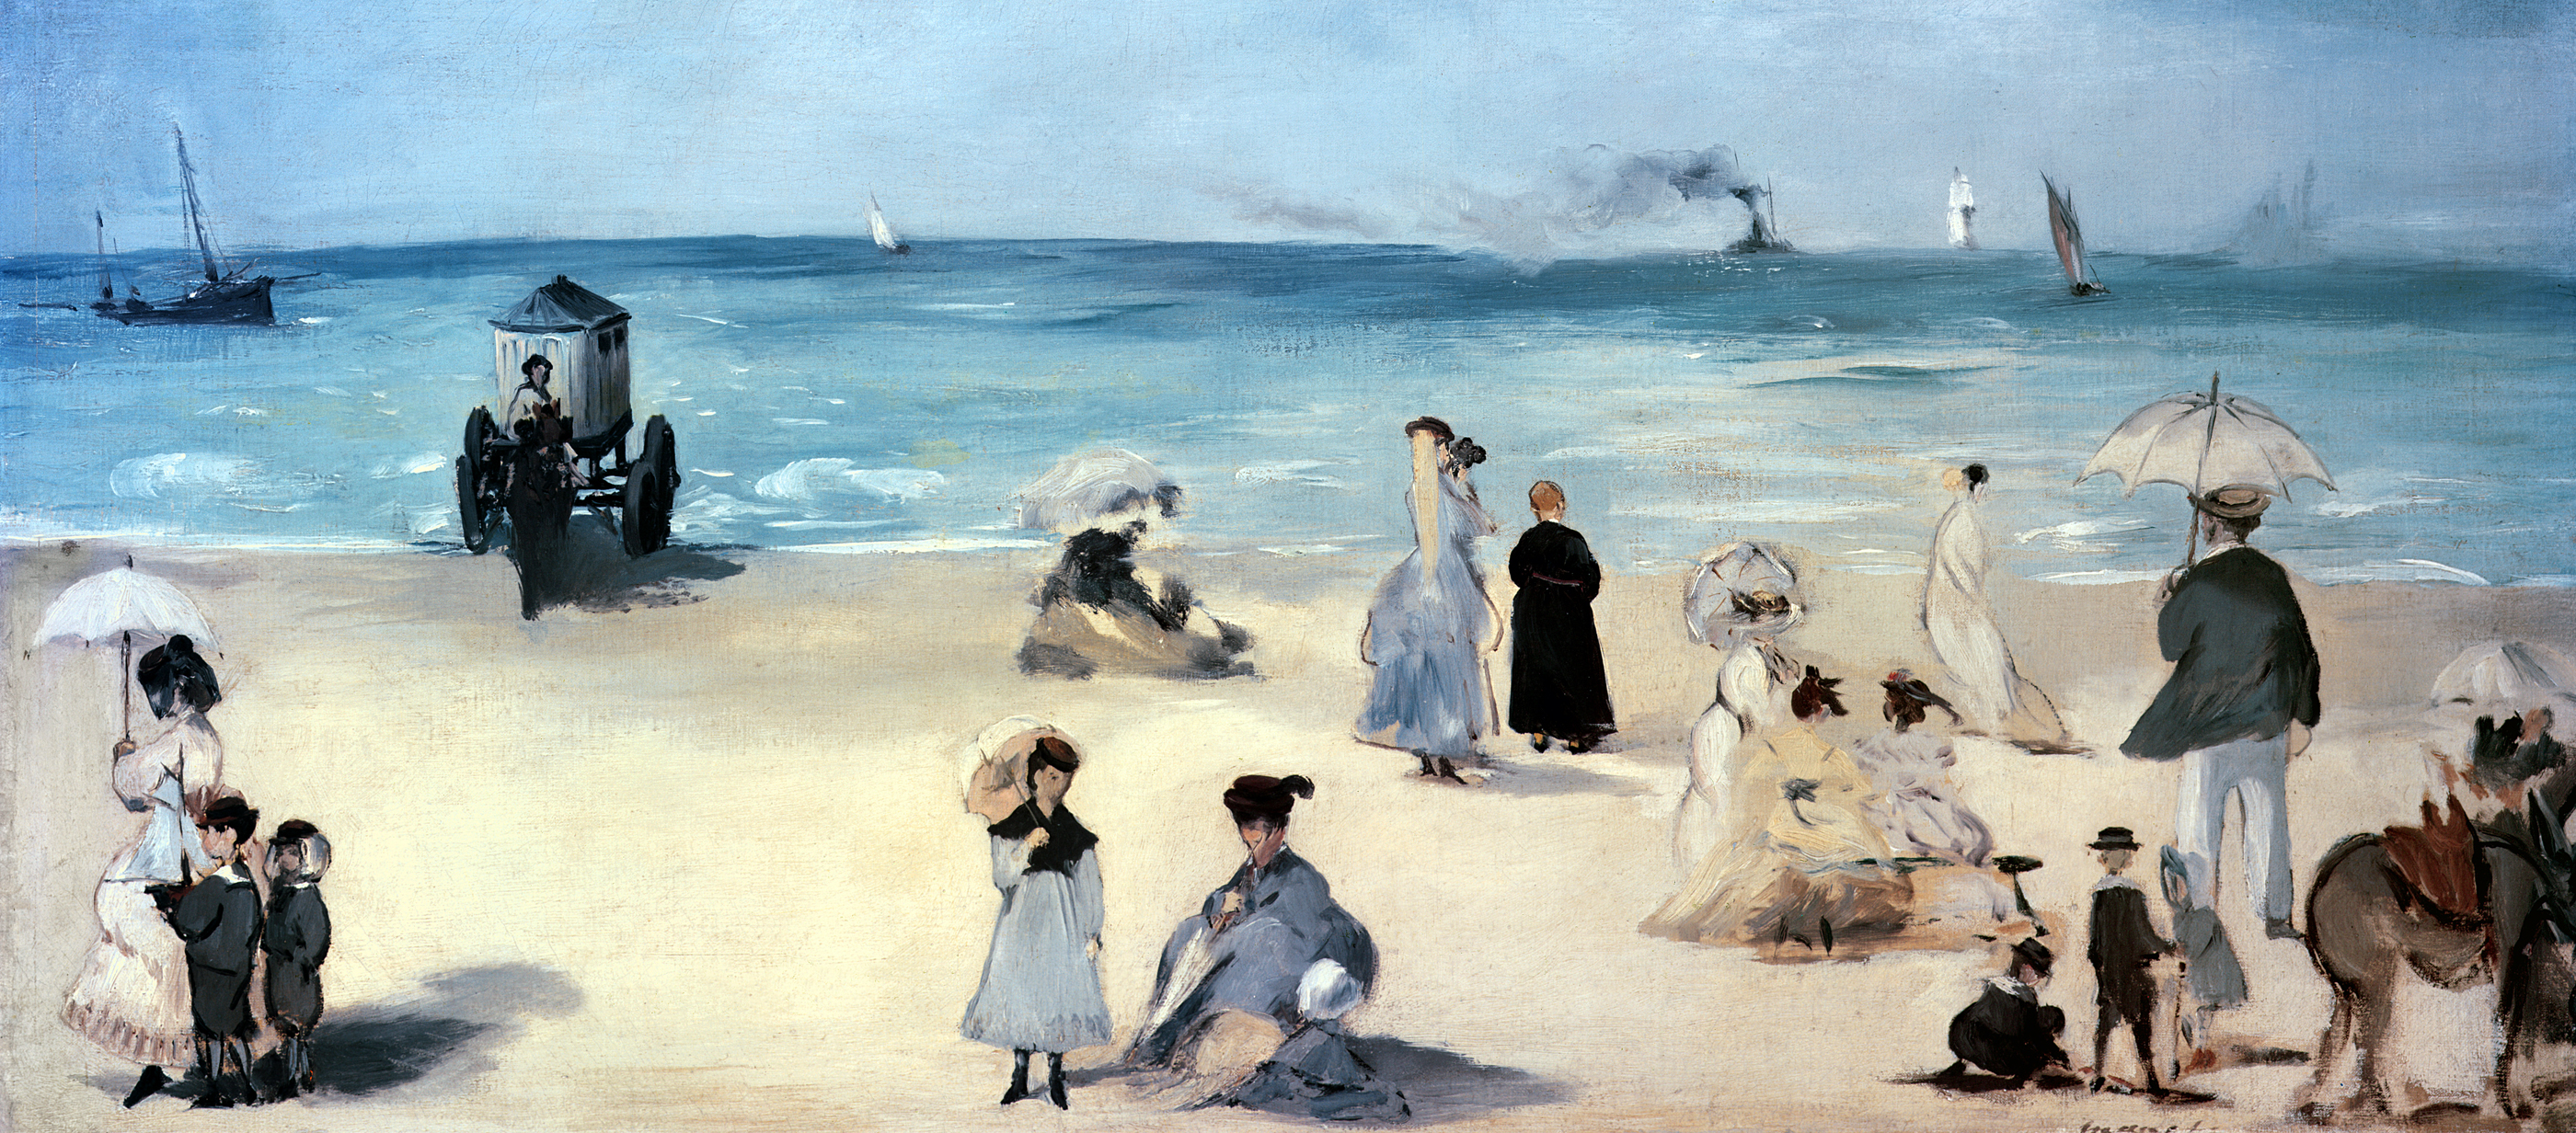 On the Beach, Boulogne-sur-Mer, by Édouard Manet, c. 1869.